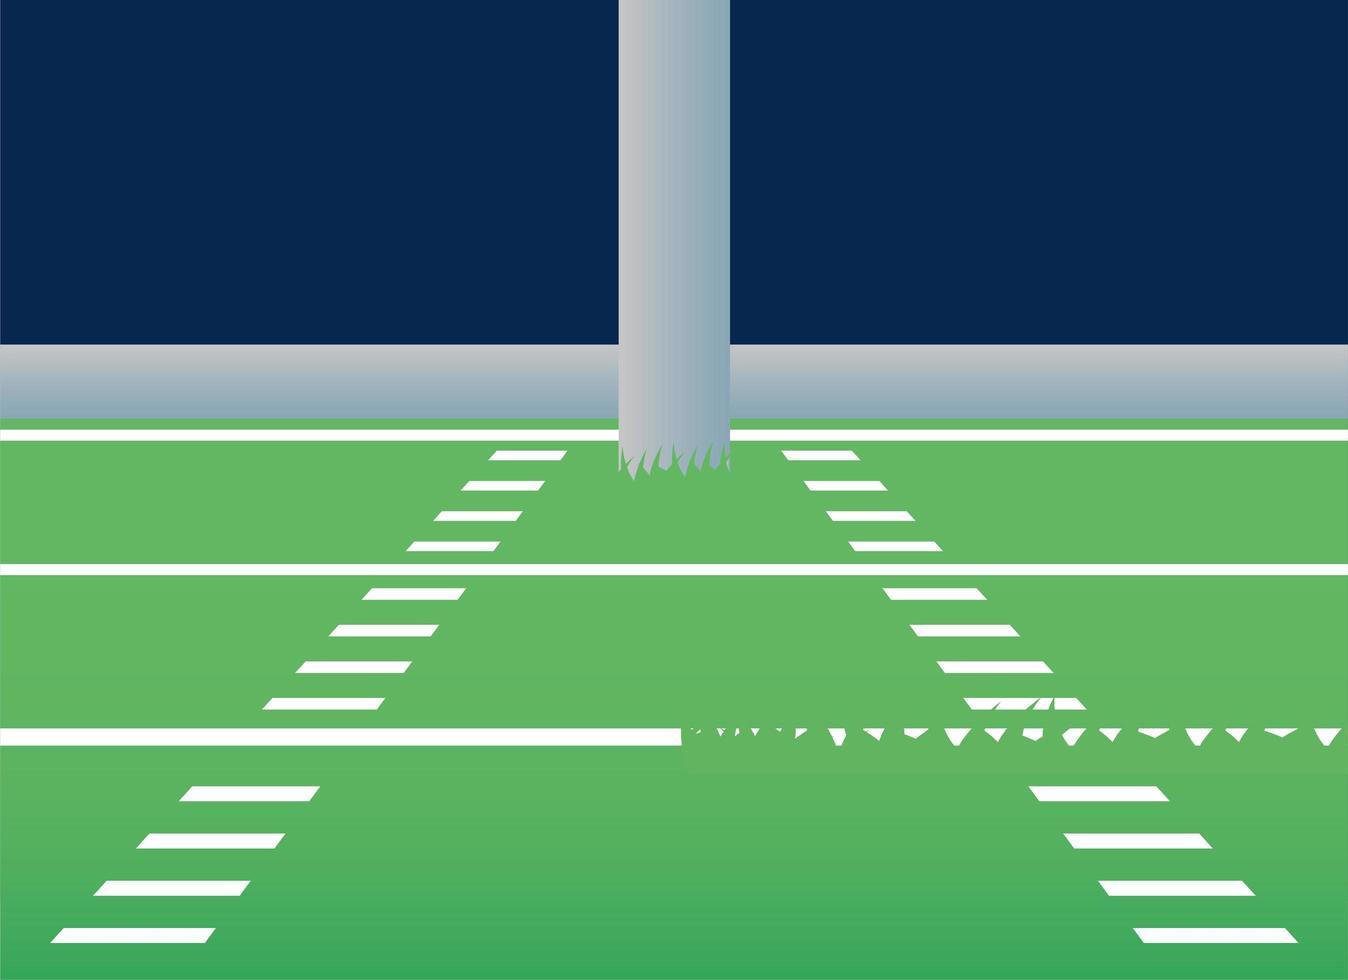 Amerikaans voetbalveld scène pictogram vector